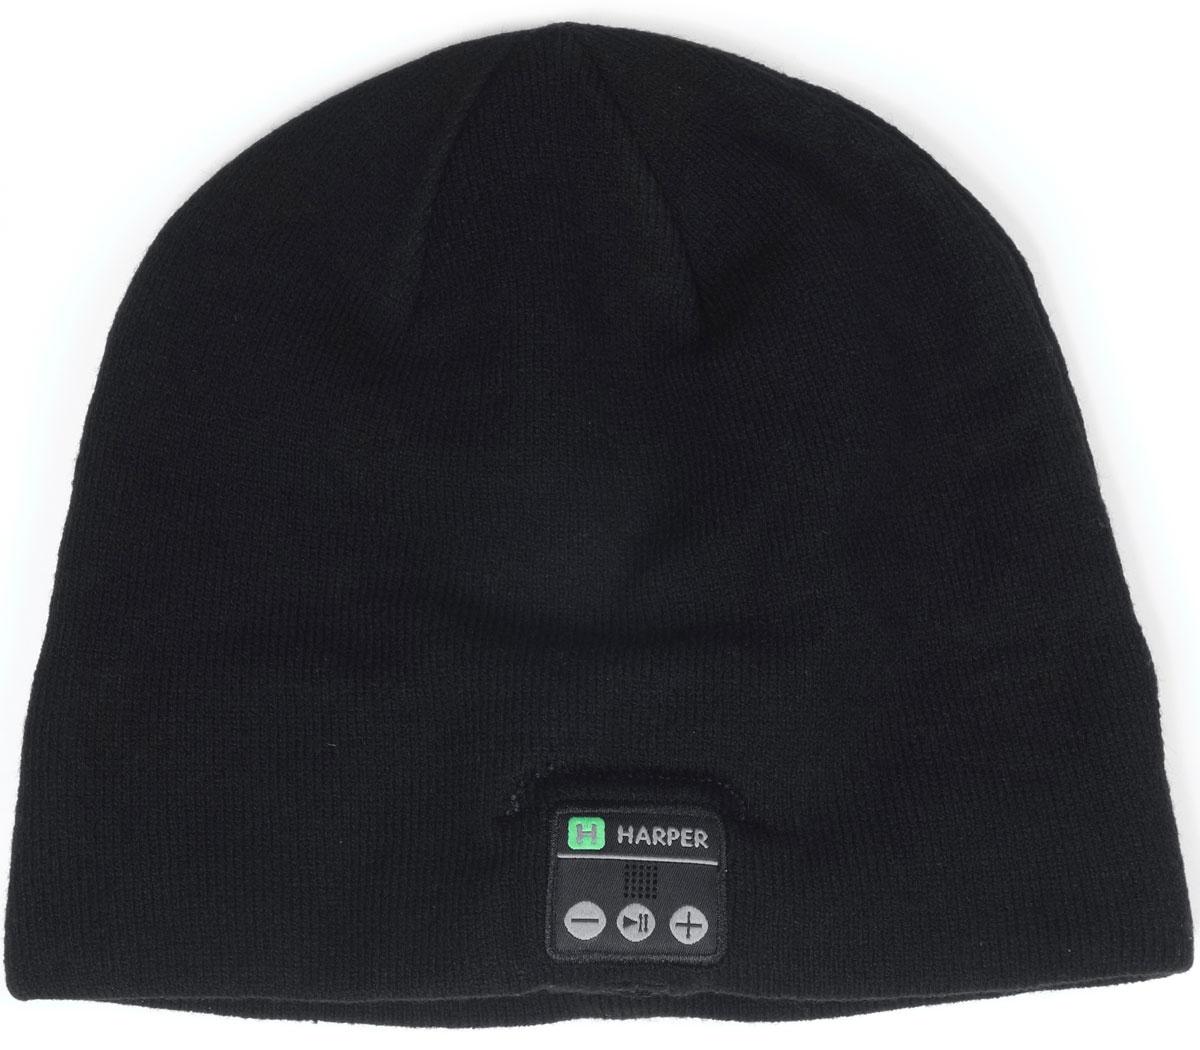 Harper HB-505, Black шапка с Bluetooth-гарнитурой